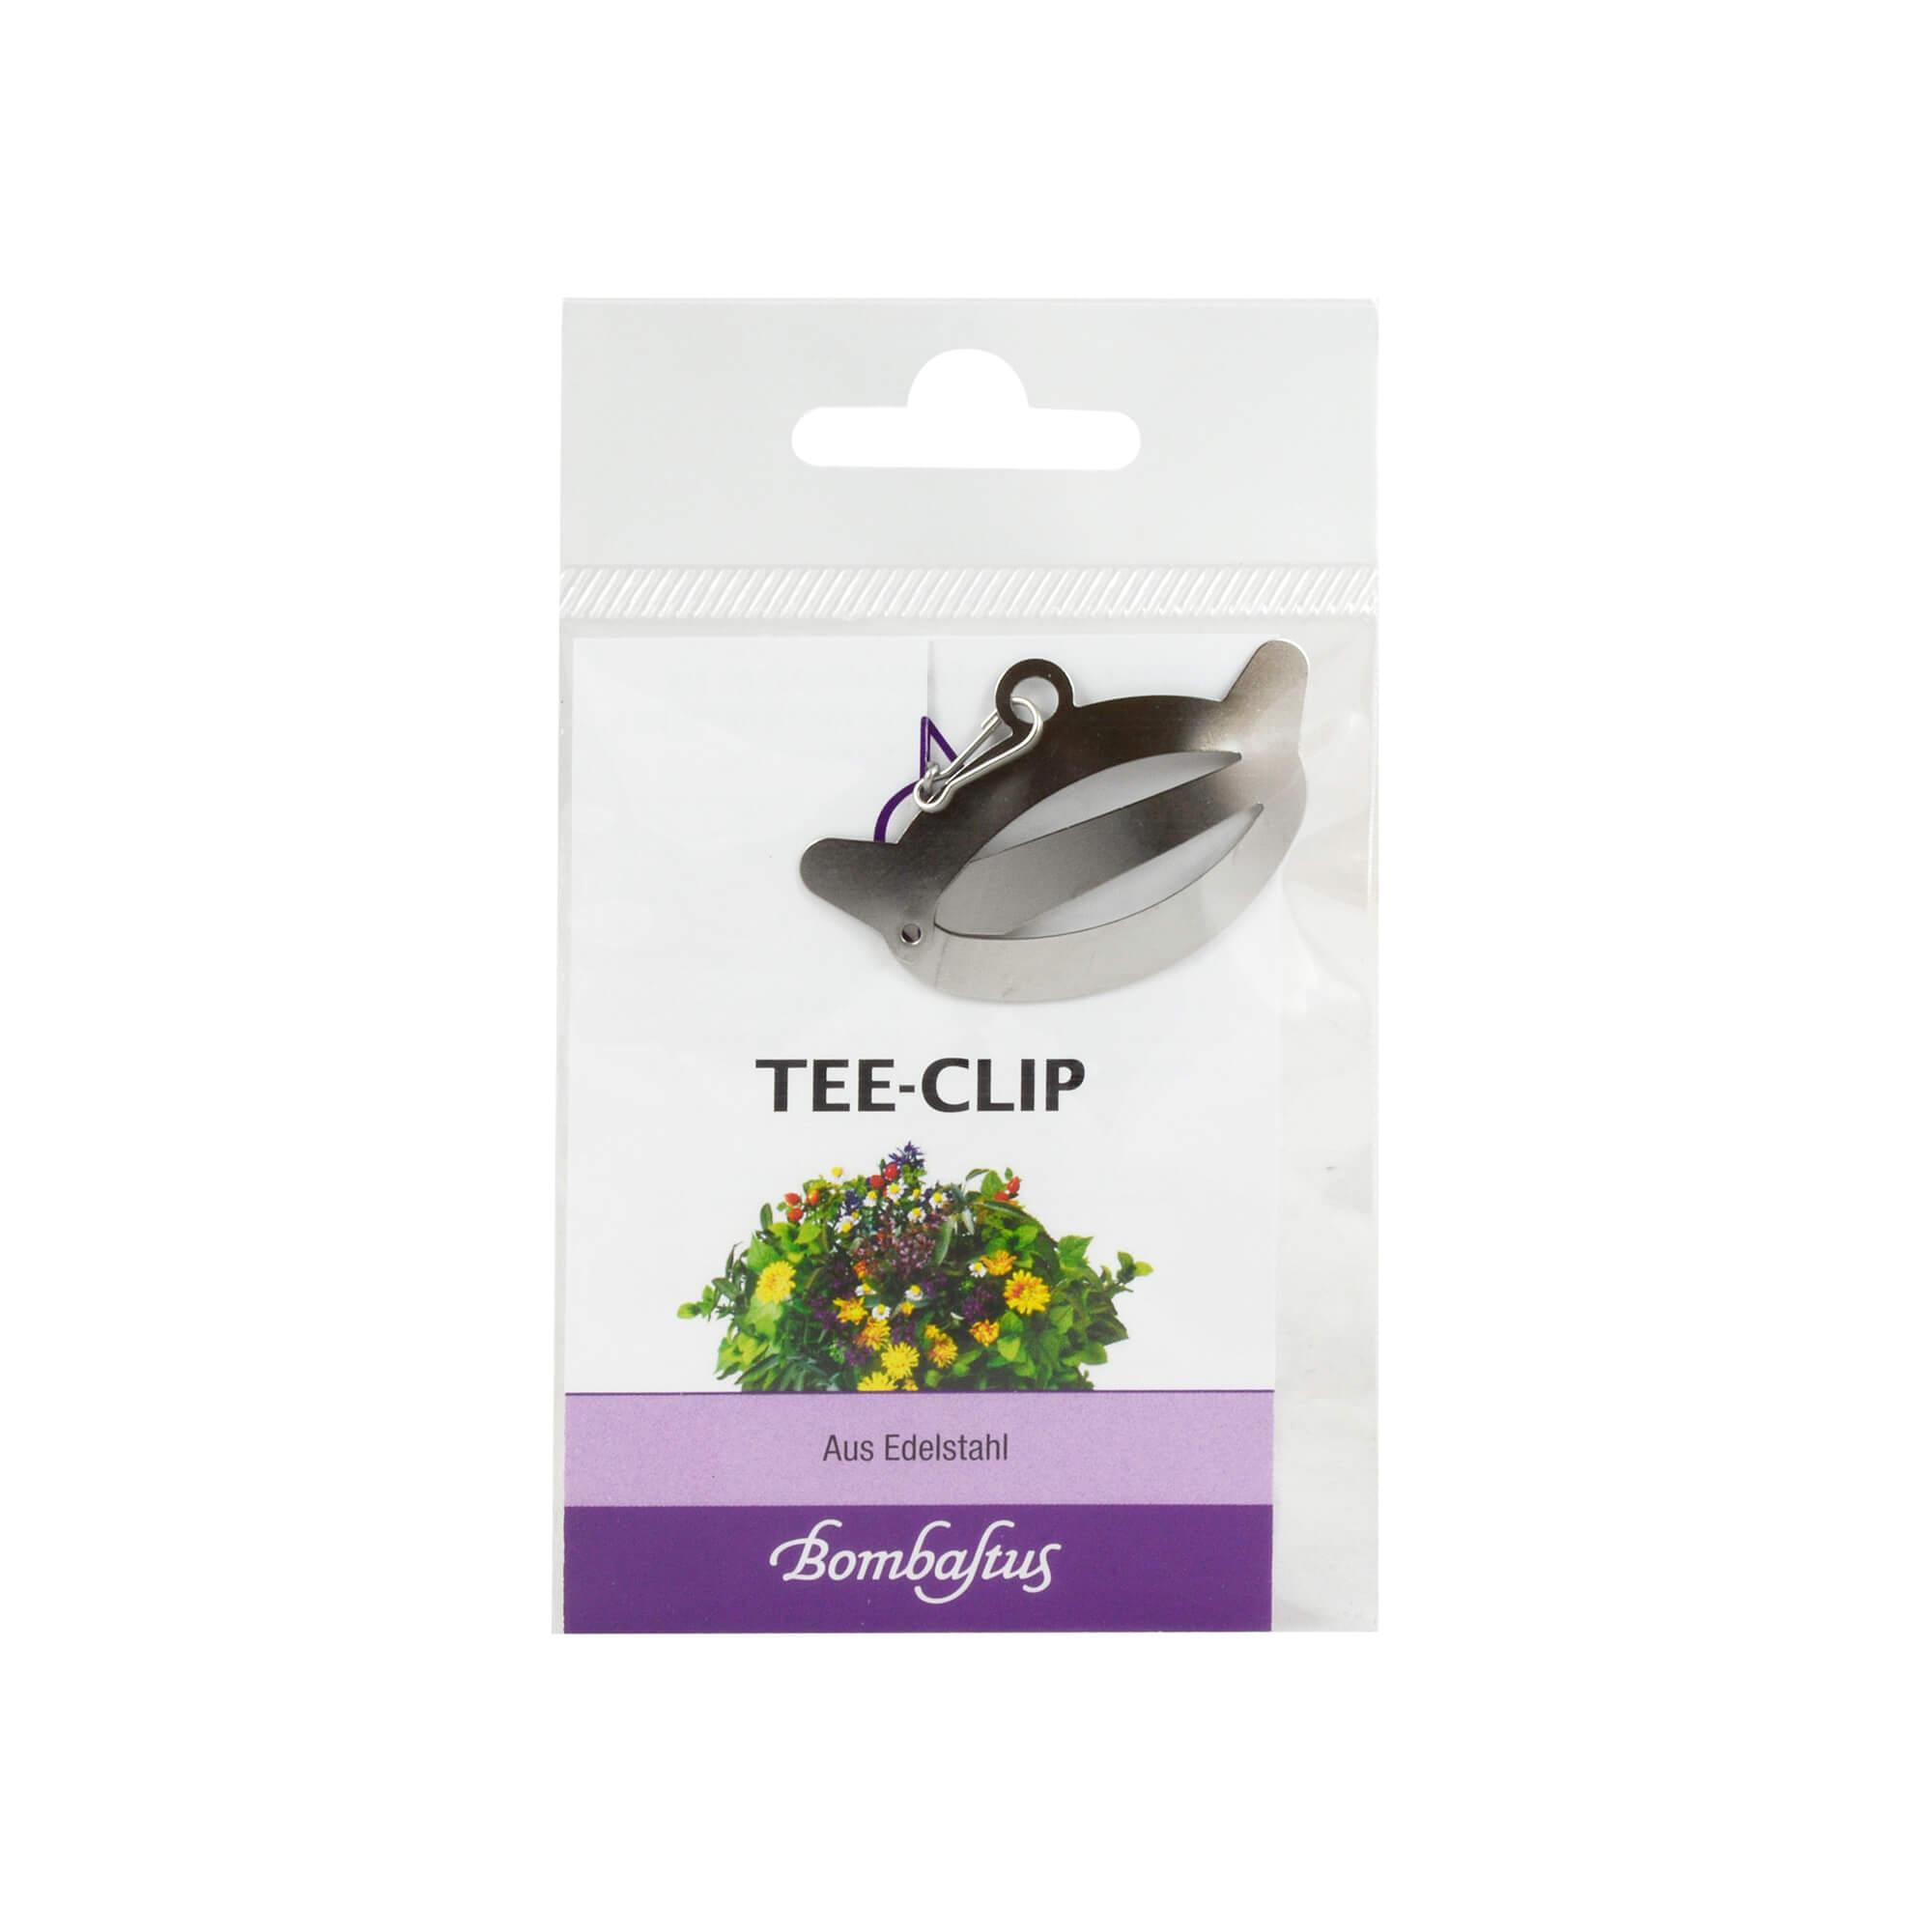 Bombastus Tee-Clip